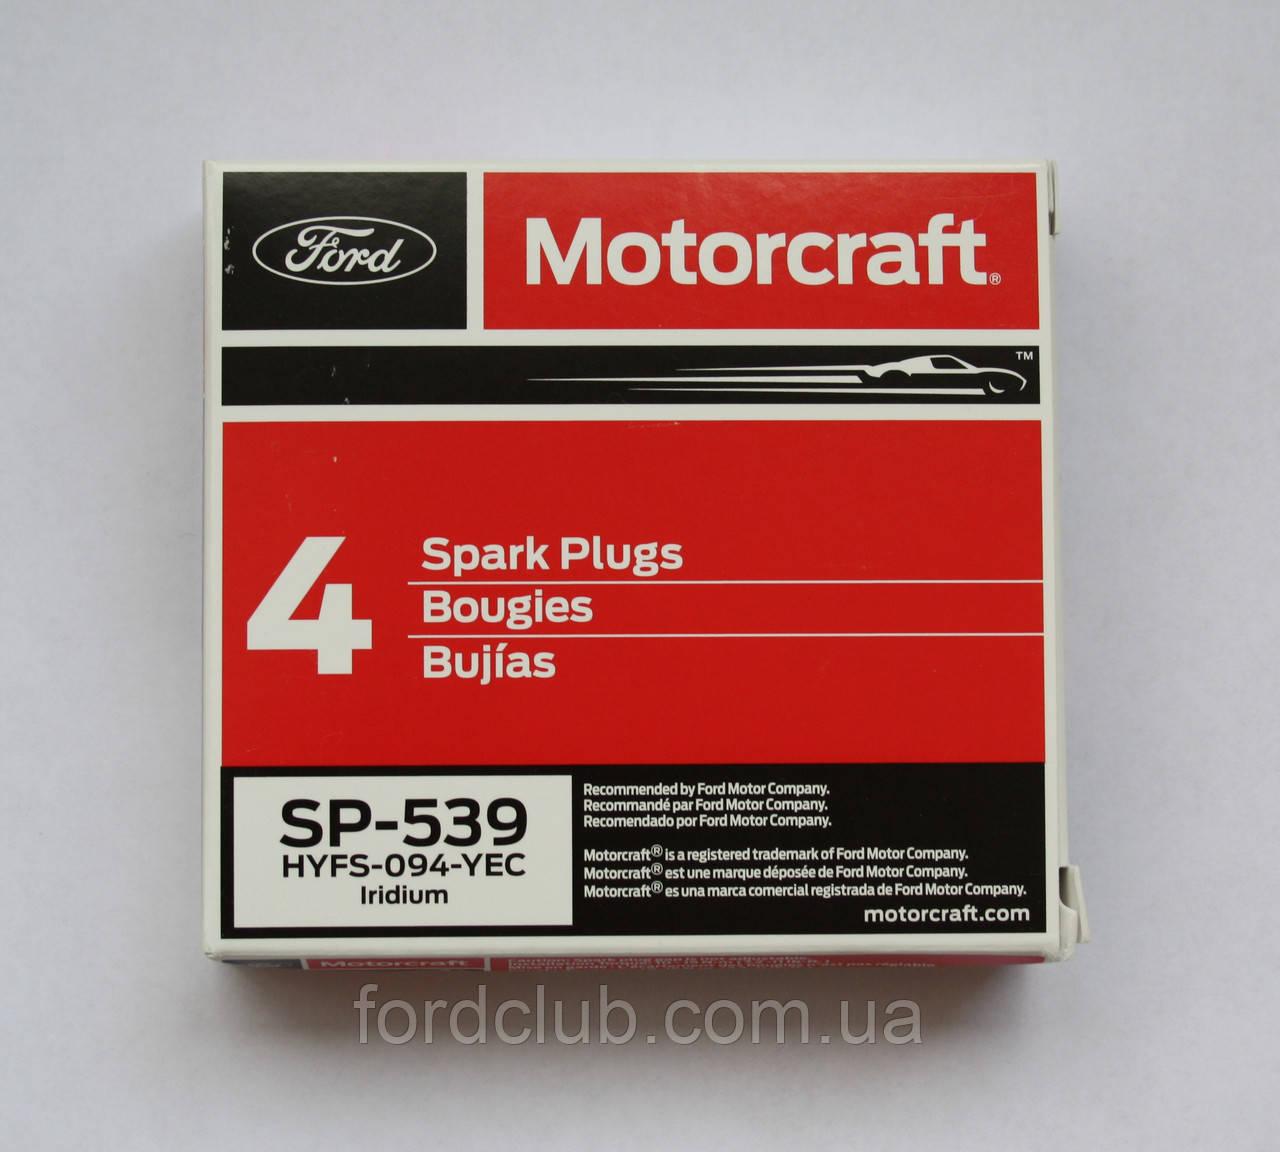 Свечи Ford Fusion USA 1.5; Motorcraft SP-539